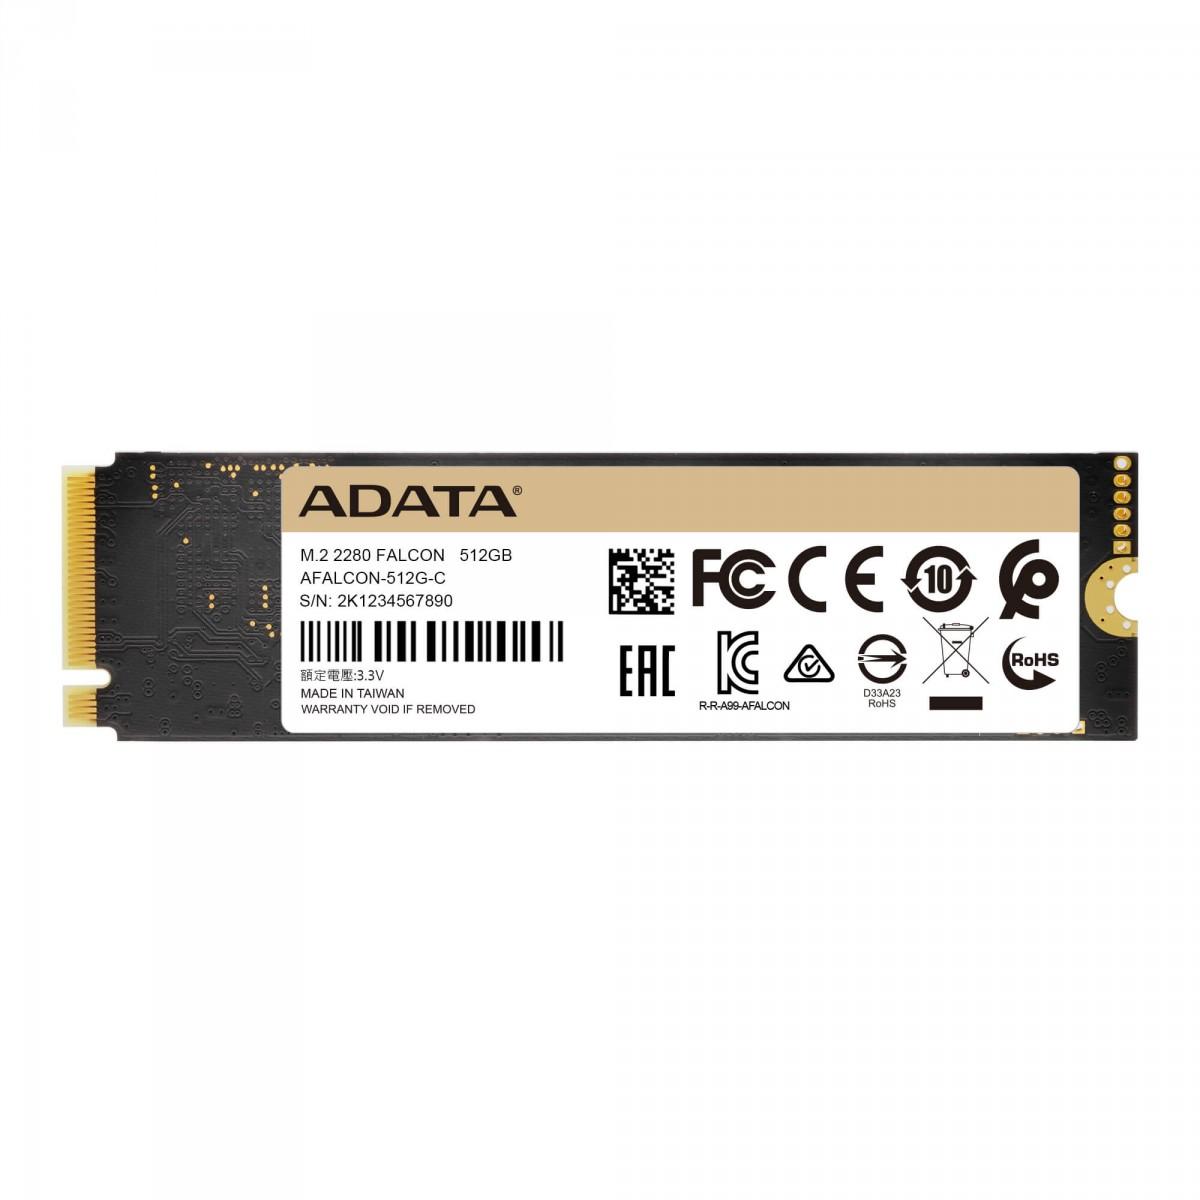 SSD Adata Falcon 512GB, M.2 2280 NVMe, Leitura 3100MBs e Gravação 1500MBs, AFALCON-512G-C